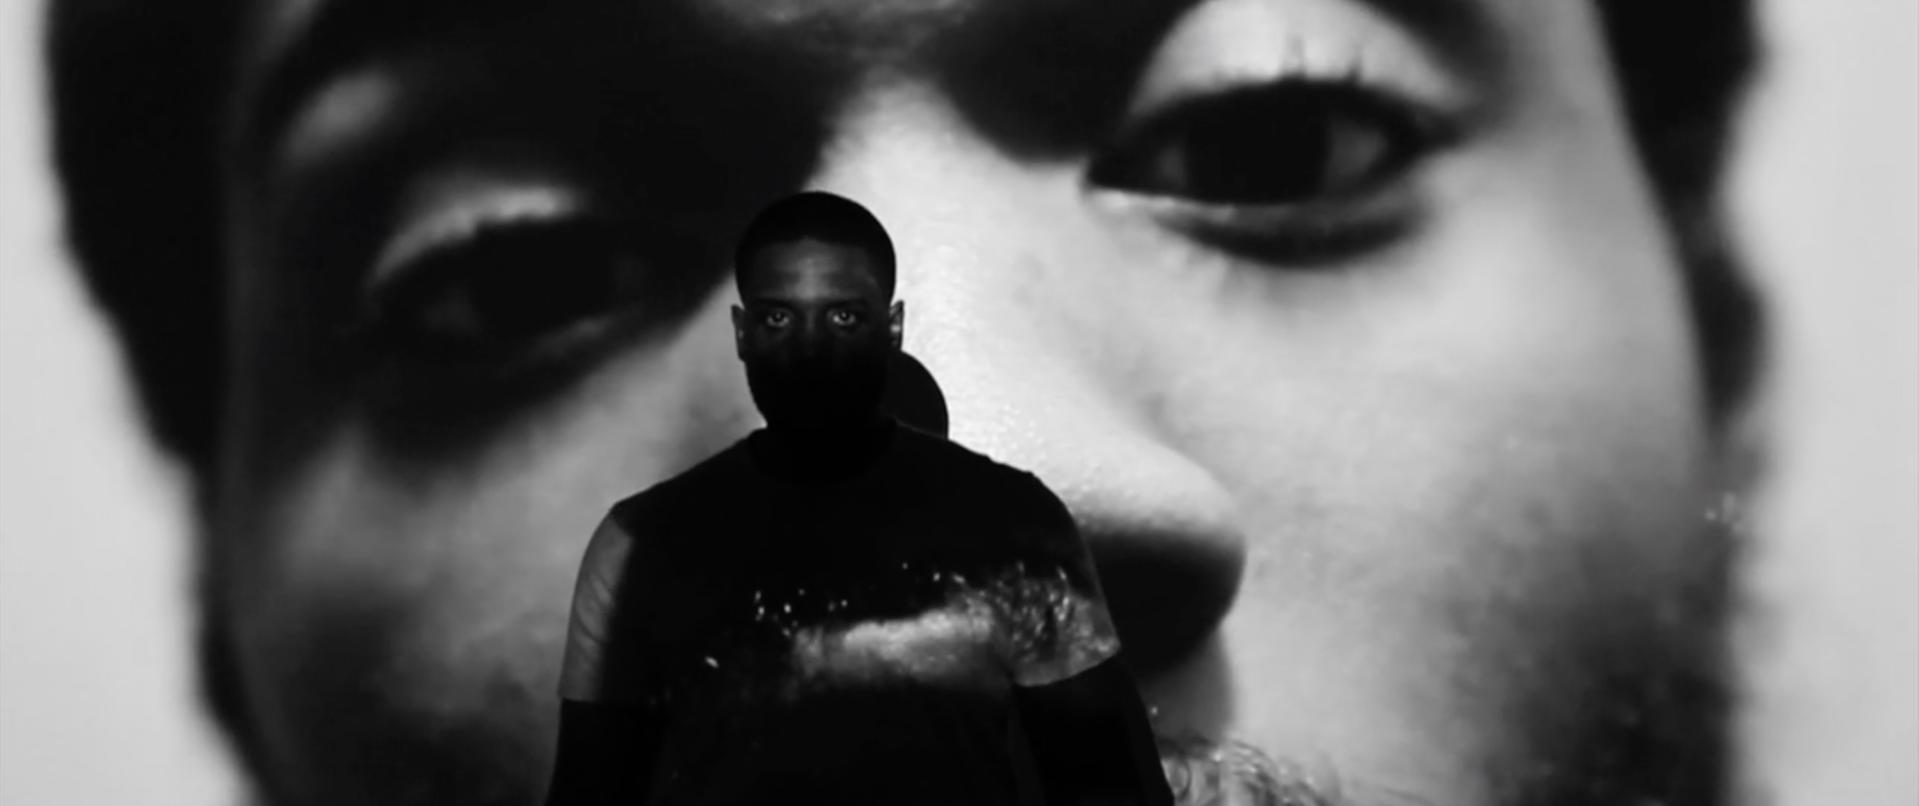 Video Still: Dual Consciousness, 2014